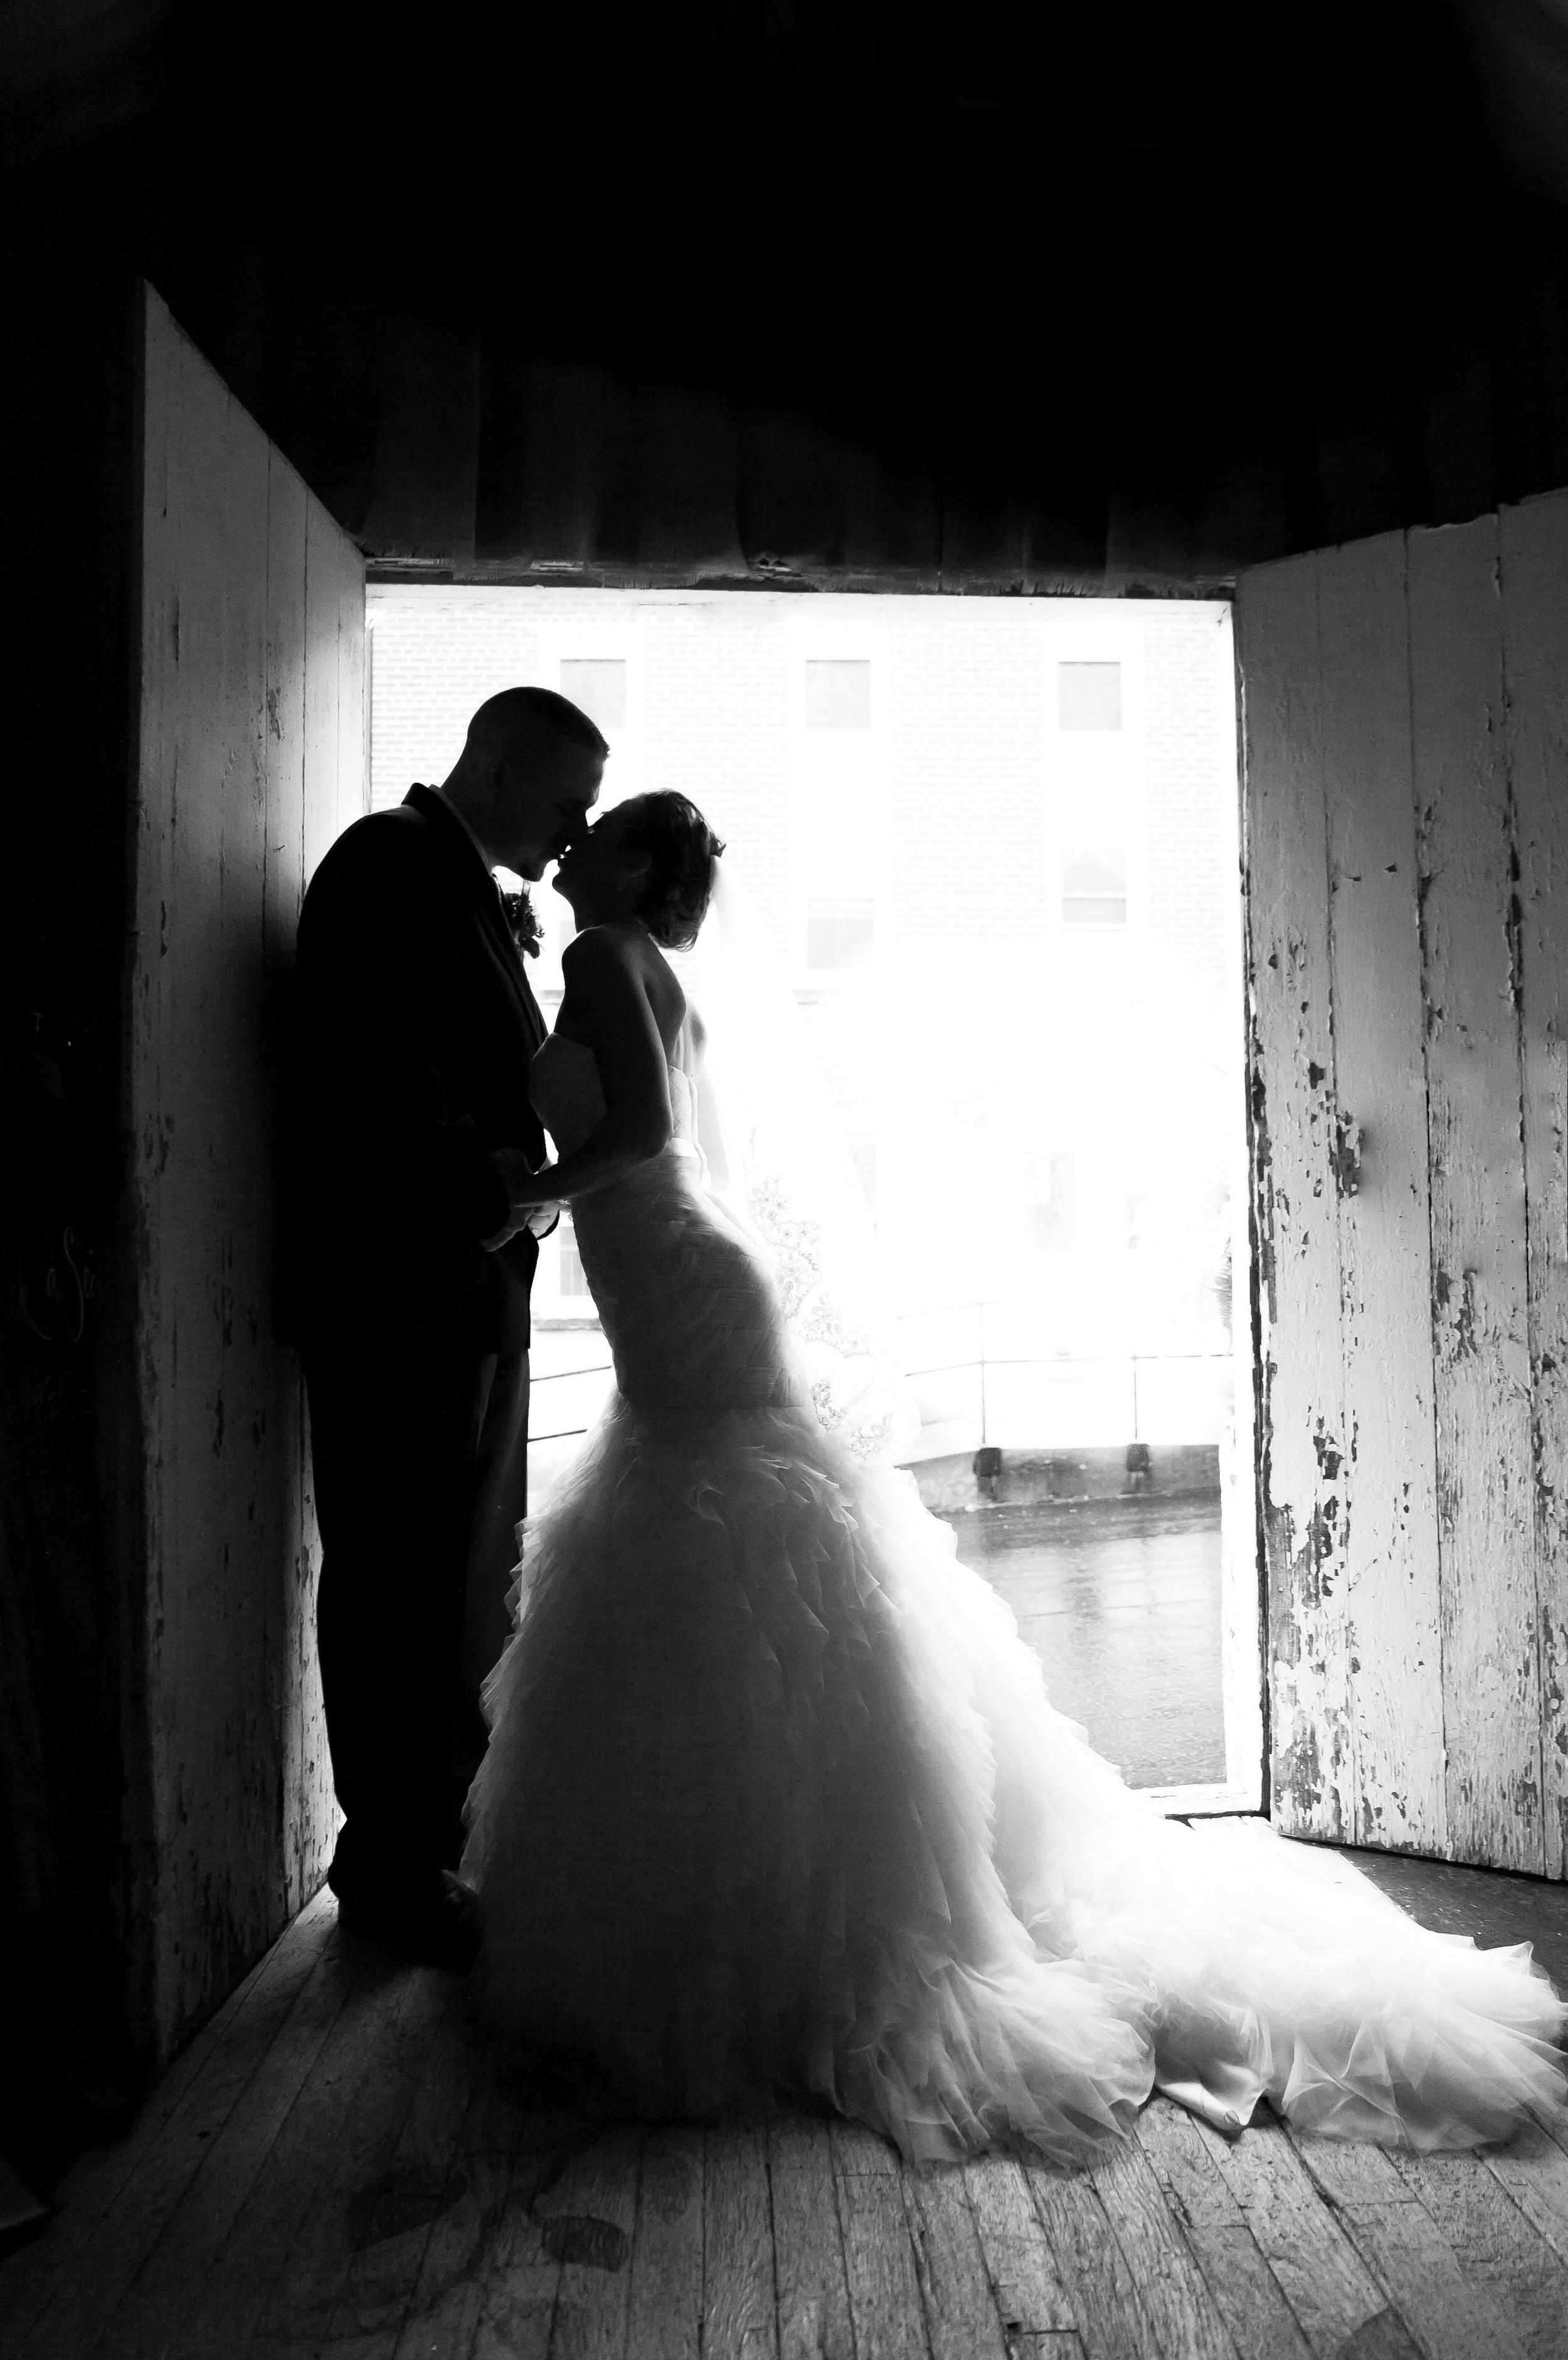 The kyle house wedding bent-lee carr photography blacksburg virginia portrait and wedding photographer